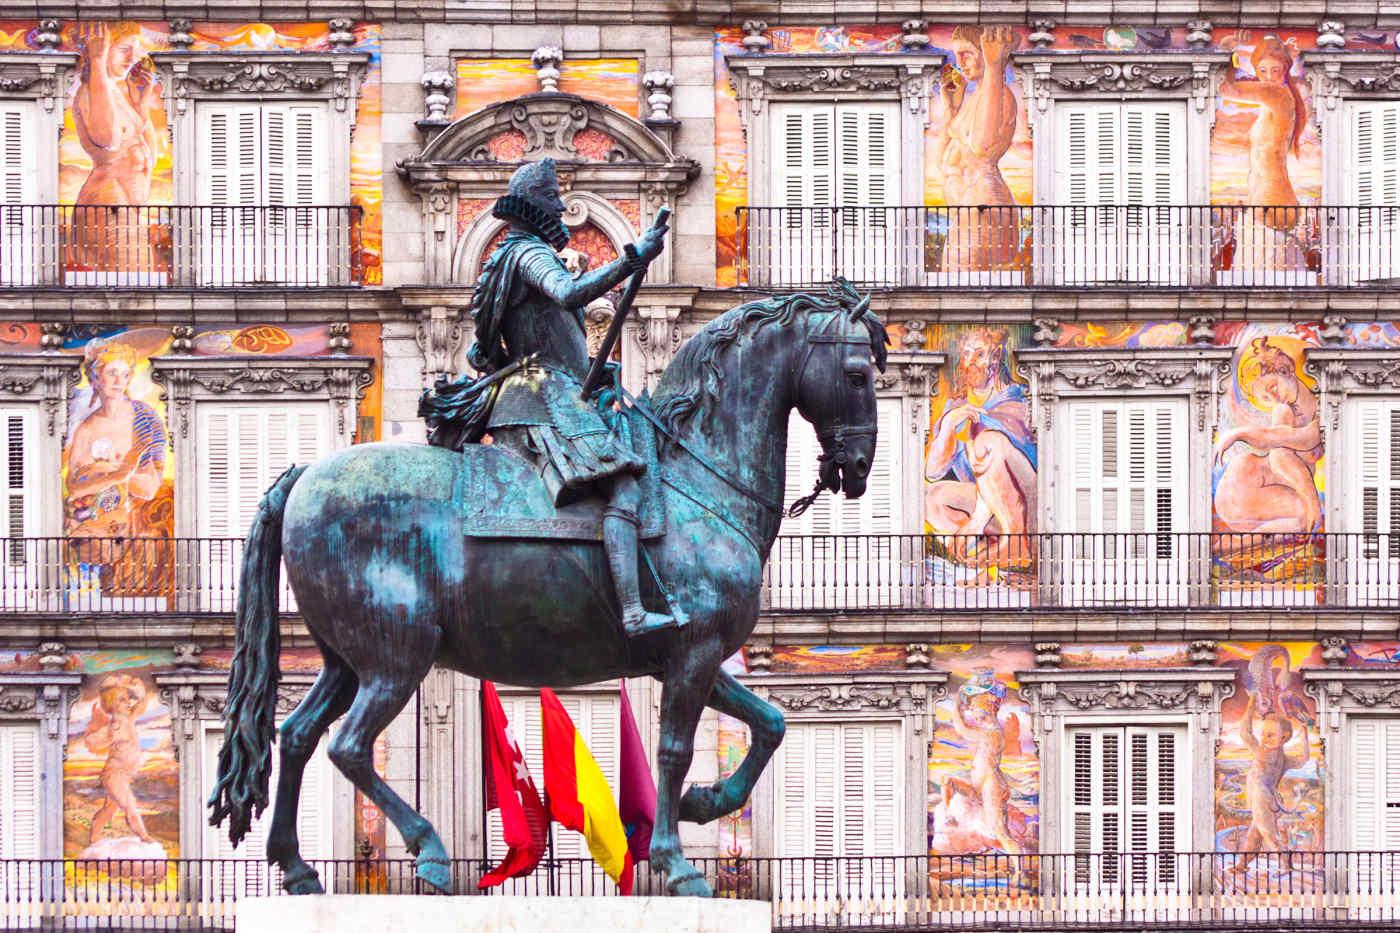 Plaza Mayor, Spain